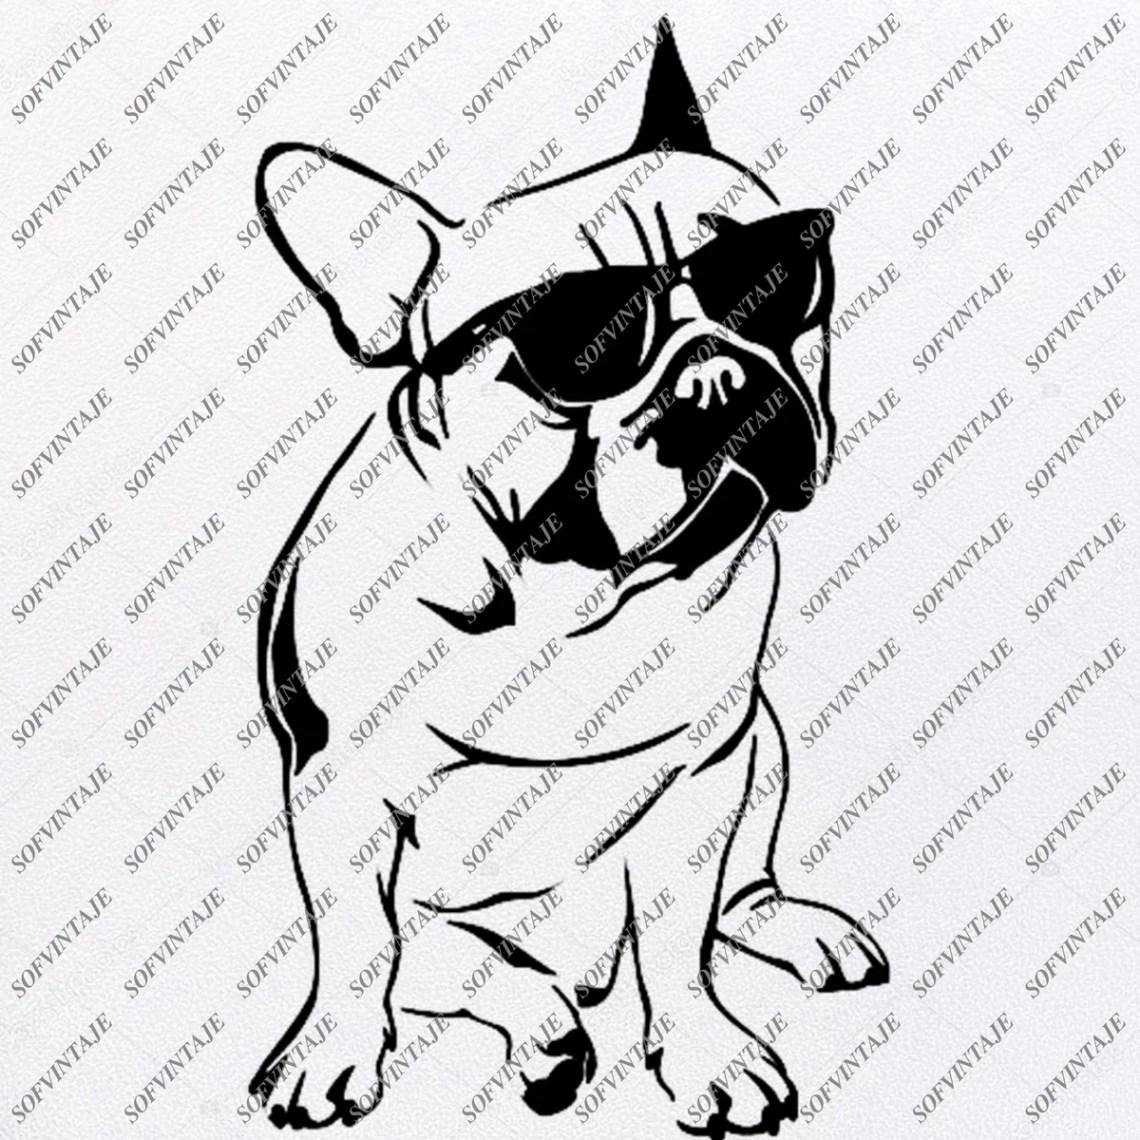 Download BullDOG Svg File-DOG Svg Original Design-BullDOG Clip art ...